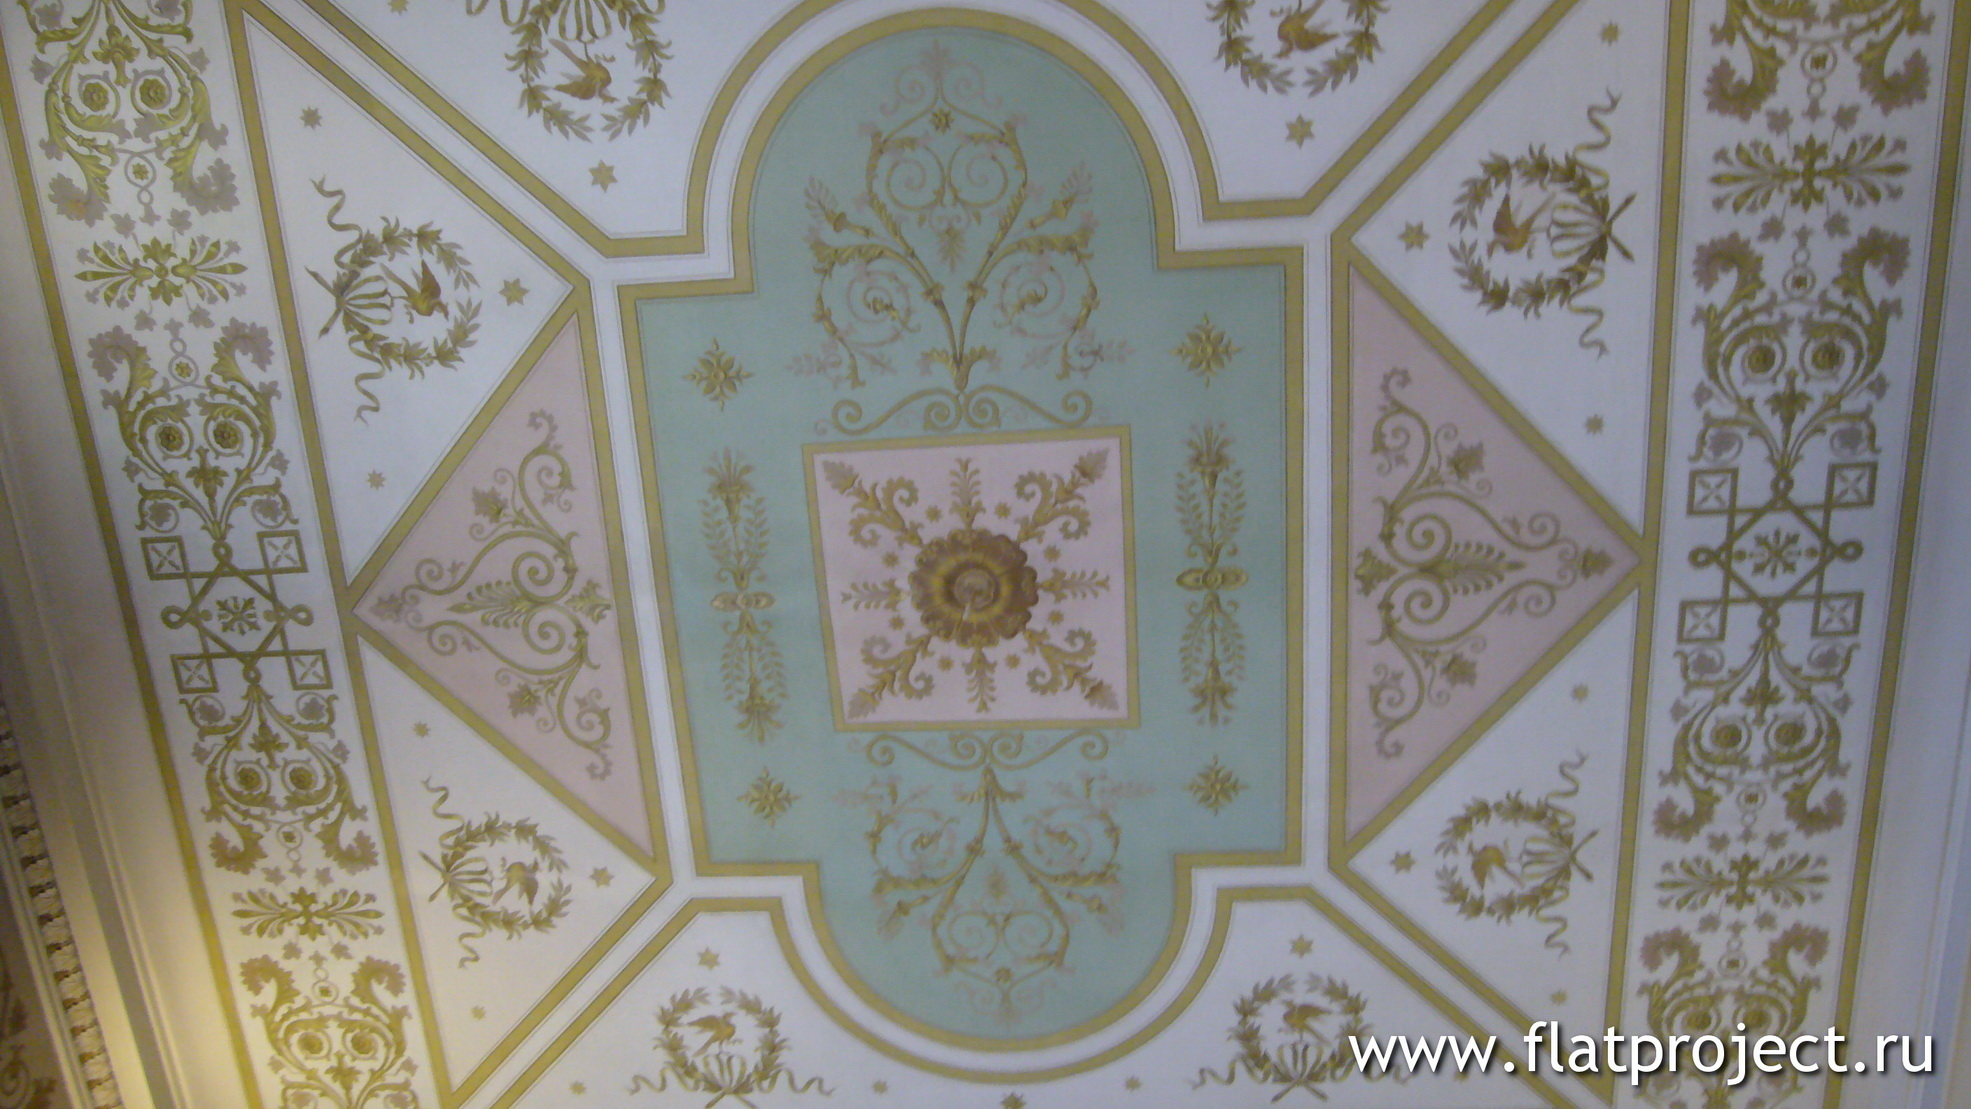 The State Hermitage museum interiors – photo 223